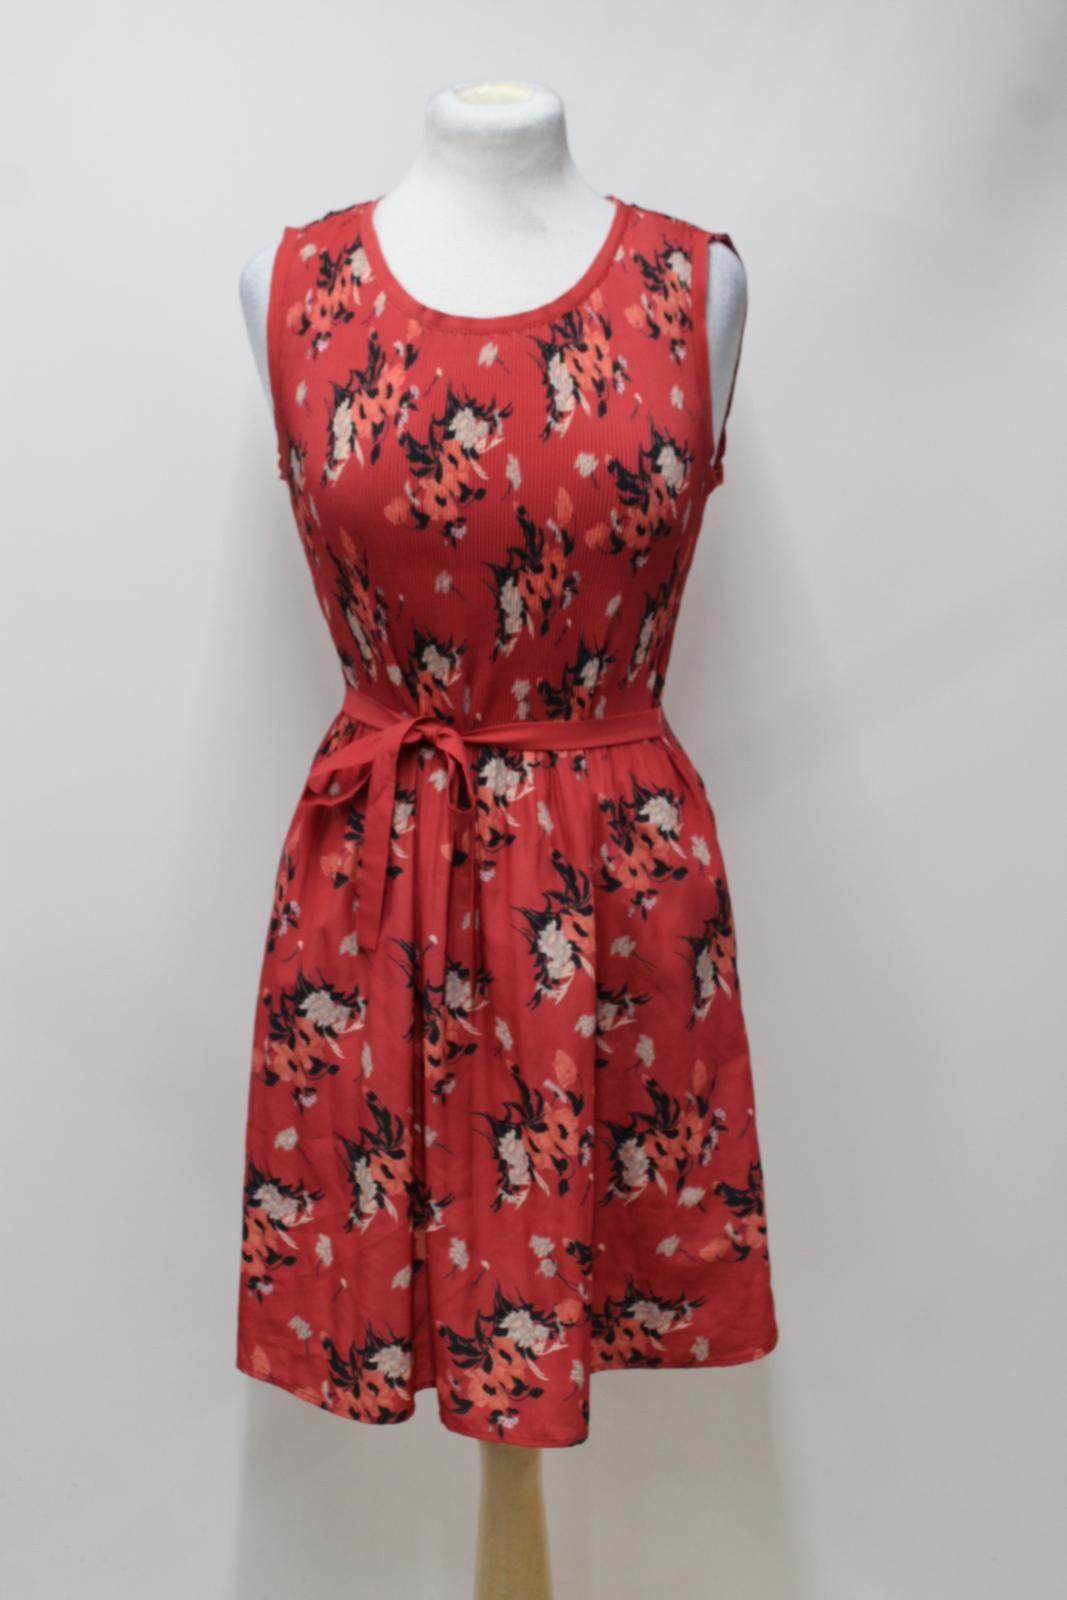 ALL-SAINTS-Ladies-Red-Floral-Print-Scoop-Neck-Sleeveless-Knee-Length-Dress-M